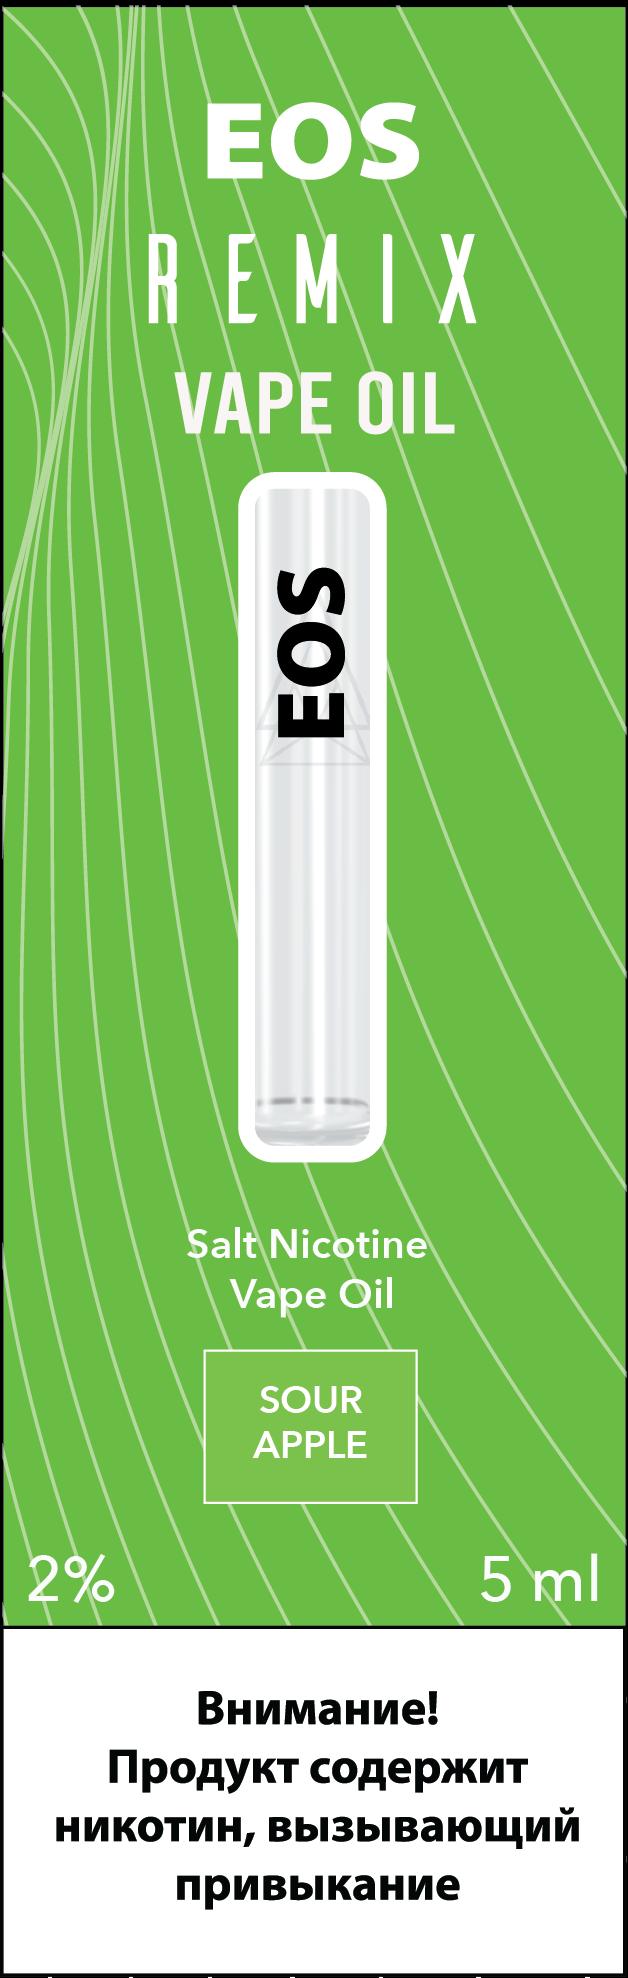 EOS REMIX SALT NIC SOUR APPLE 2% 5ml